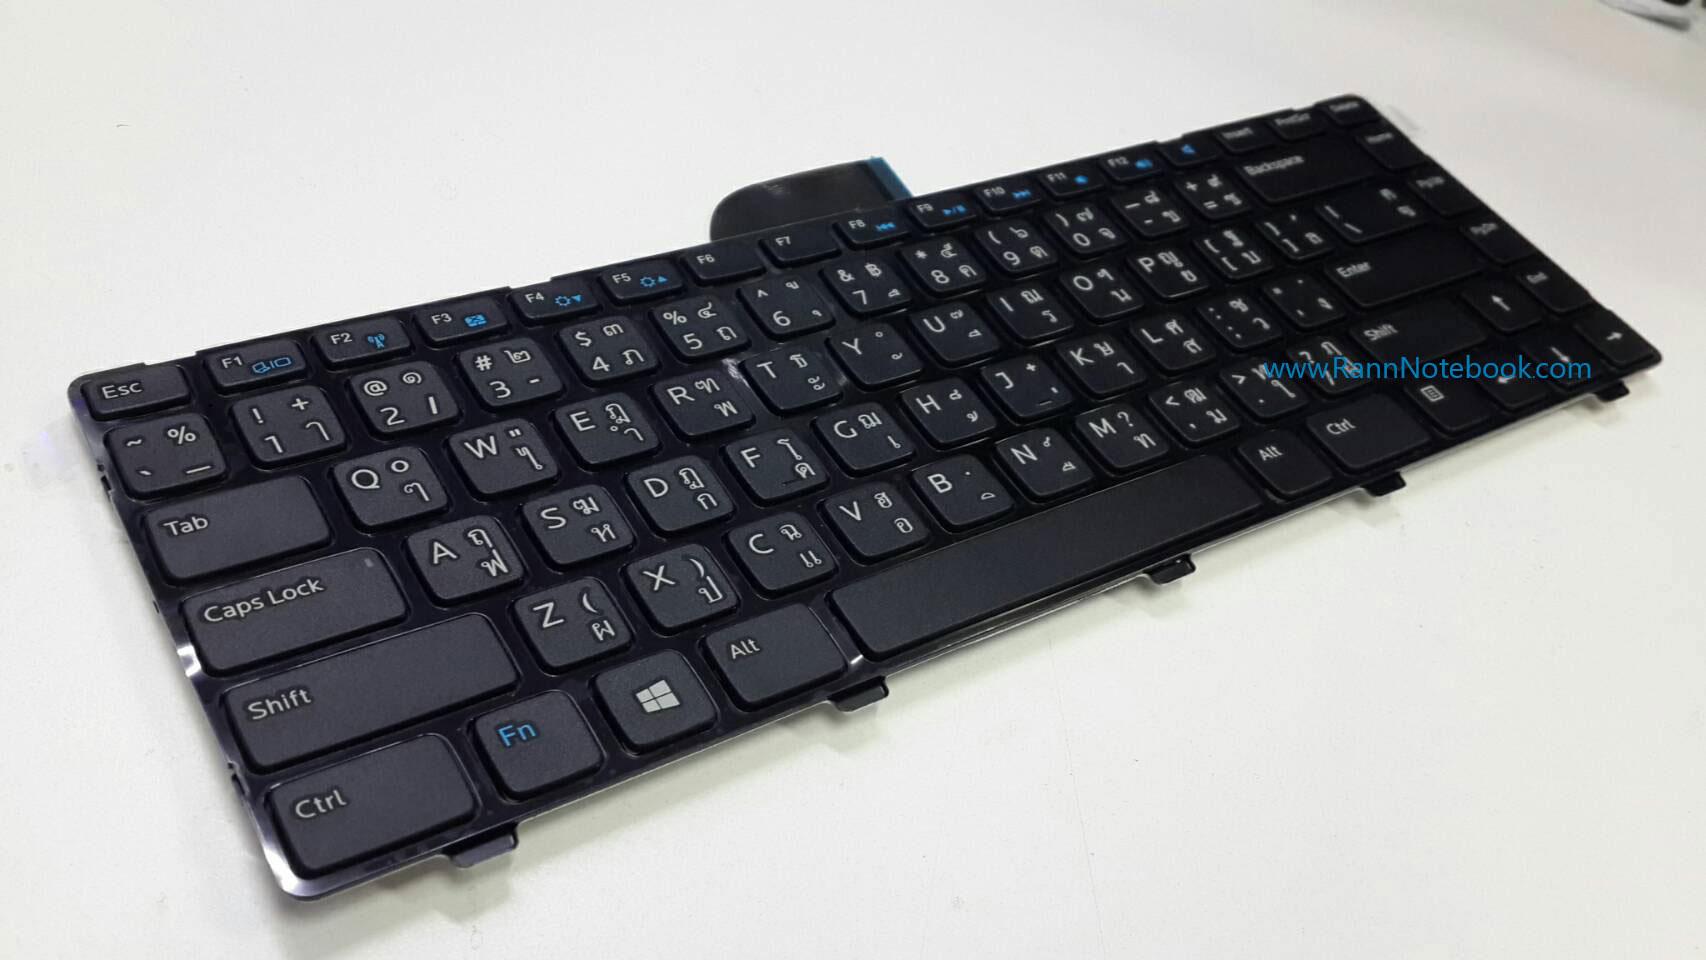 Keyboard Dell Latitude 3440 คีย์บอร์ด Dell แท้ ไทย อังกฤษ ประกัน ศูนย์ Dell Thailand